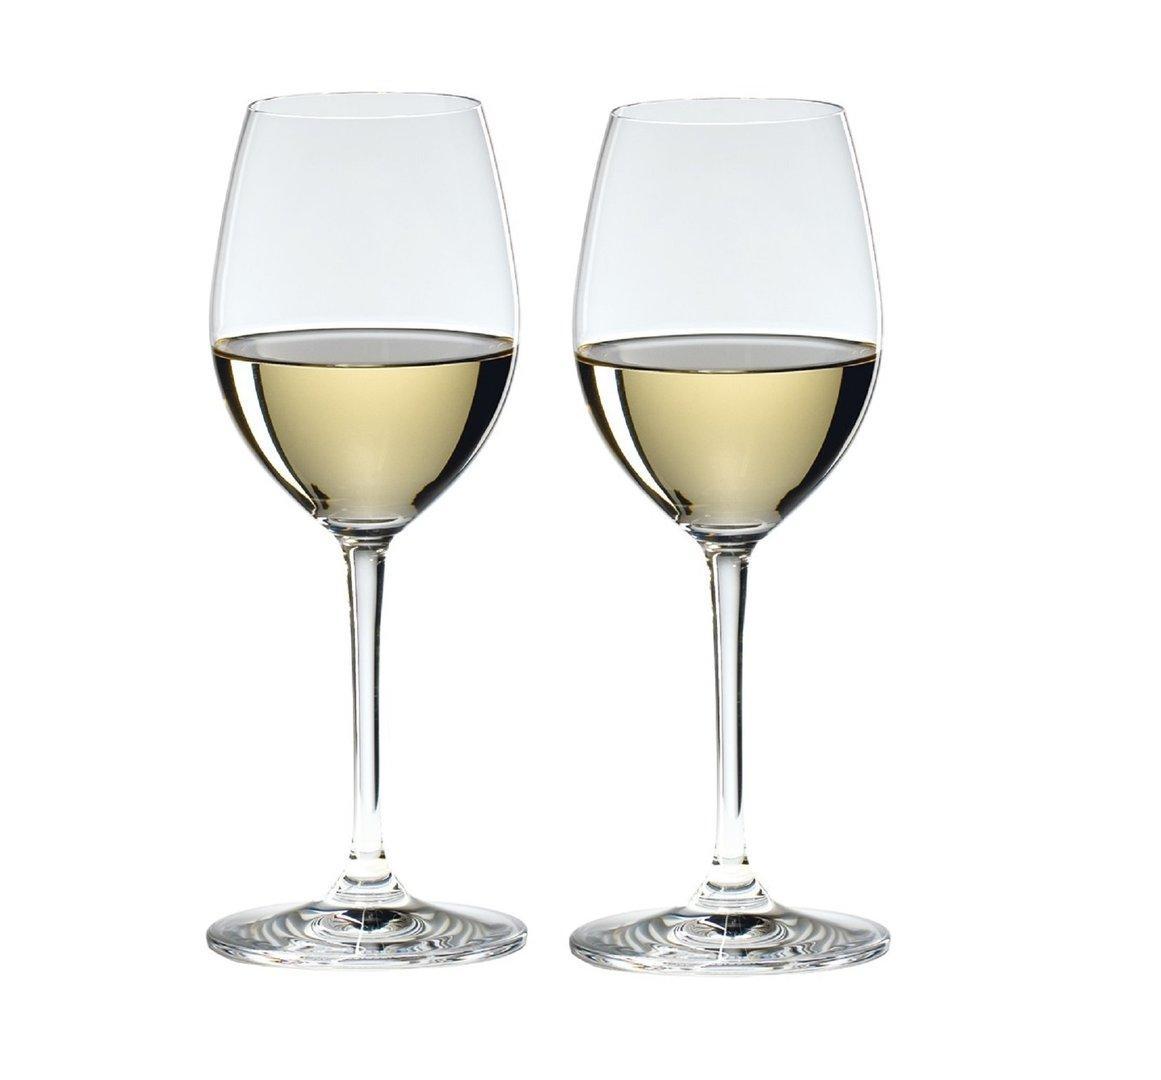 Набор бокалов для вина Sauvignon Blanc Riedel Vinum 350 мл 2 шт 6416/33